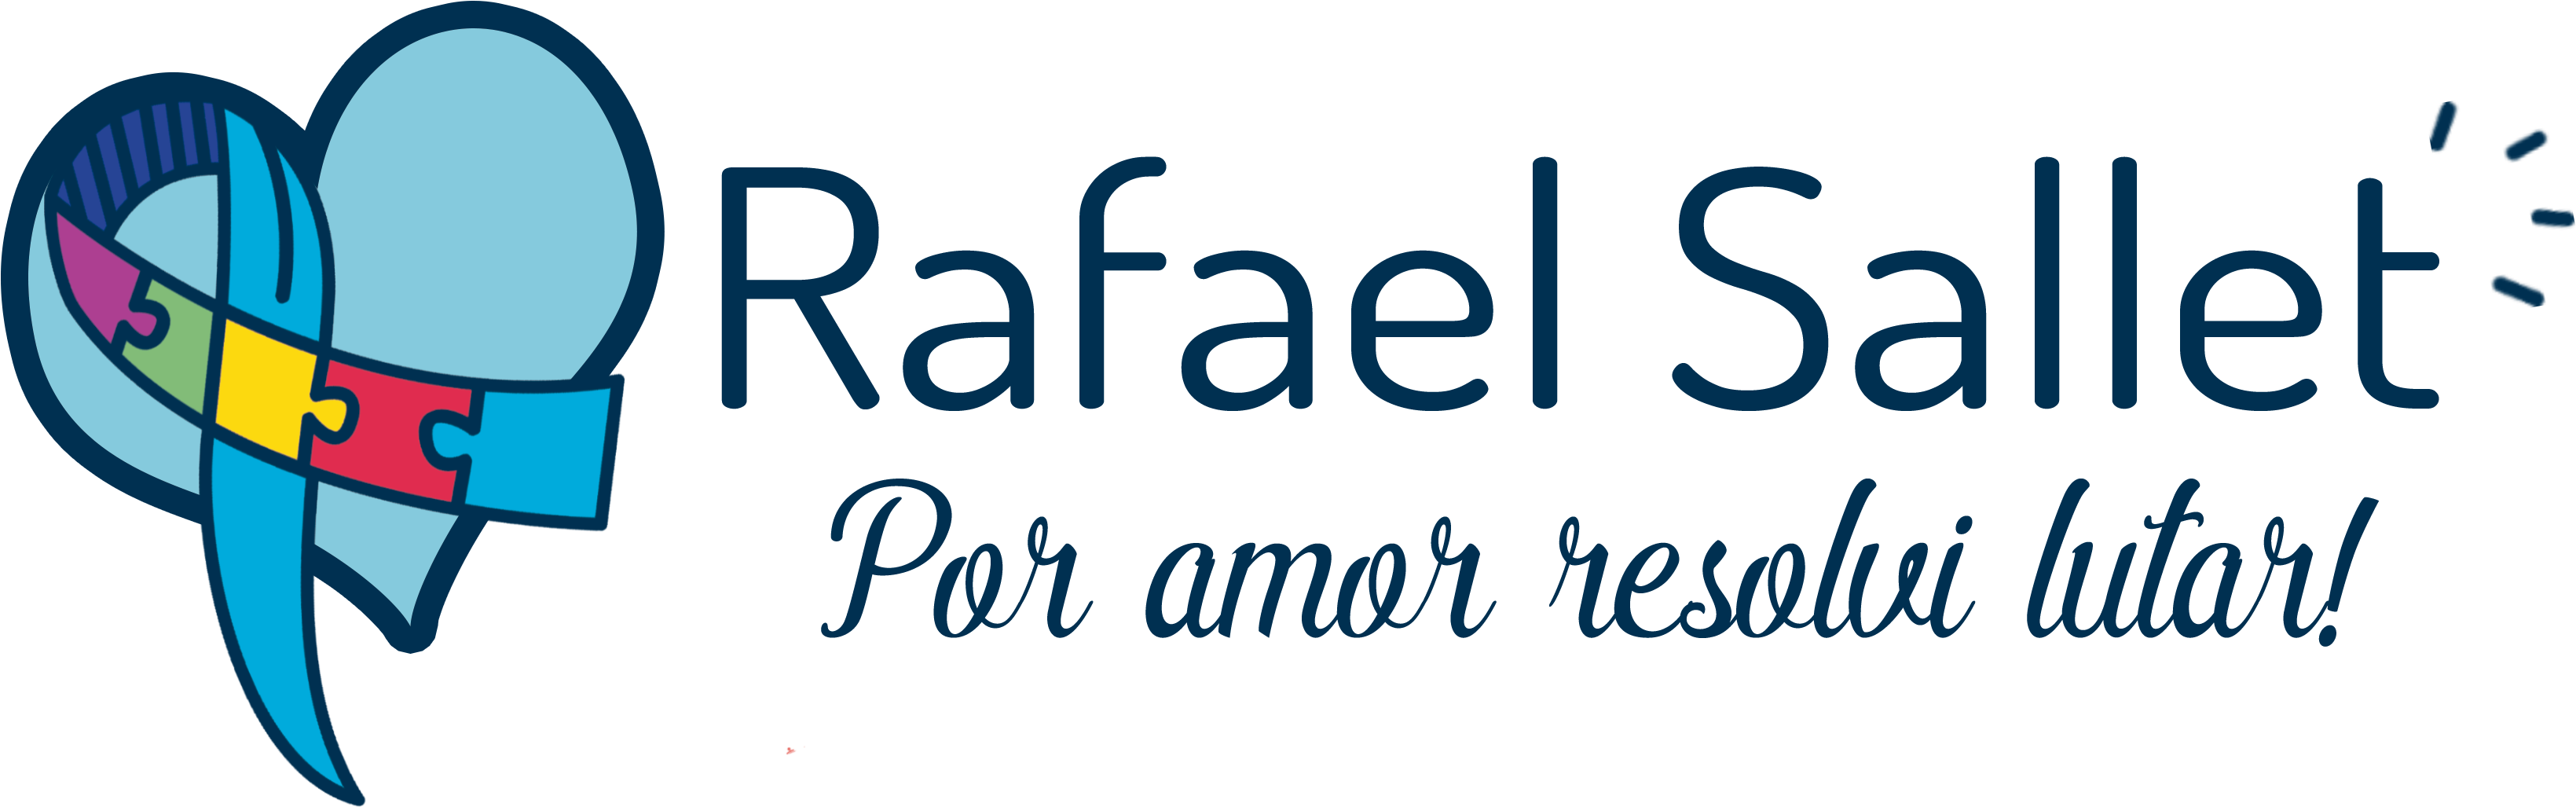 Rafael Sallet